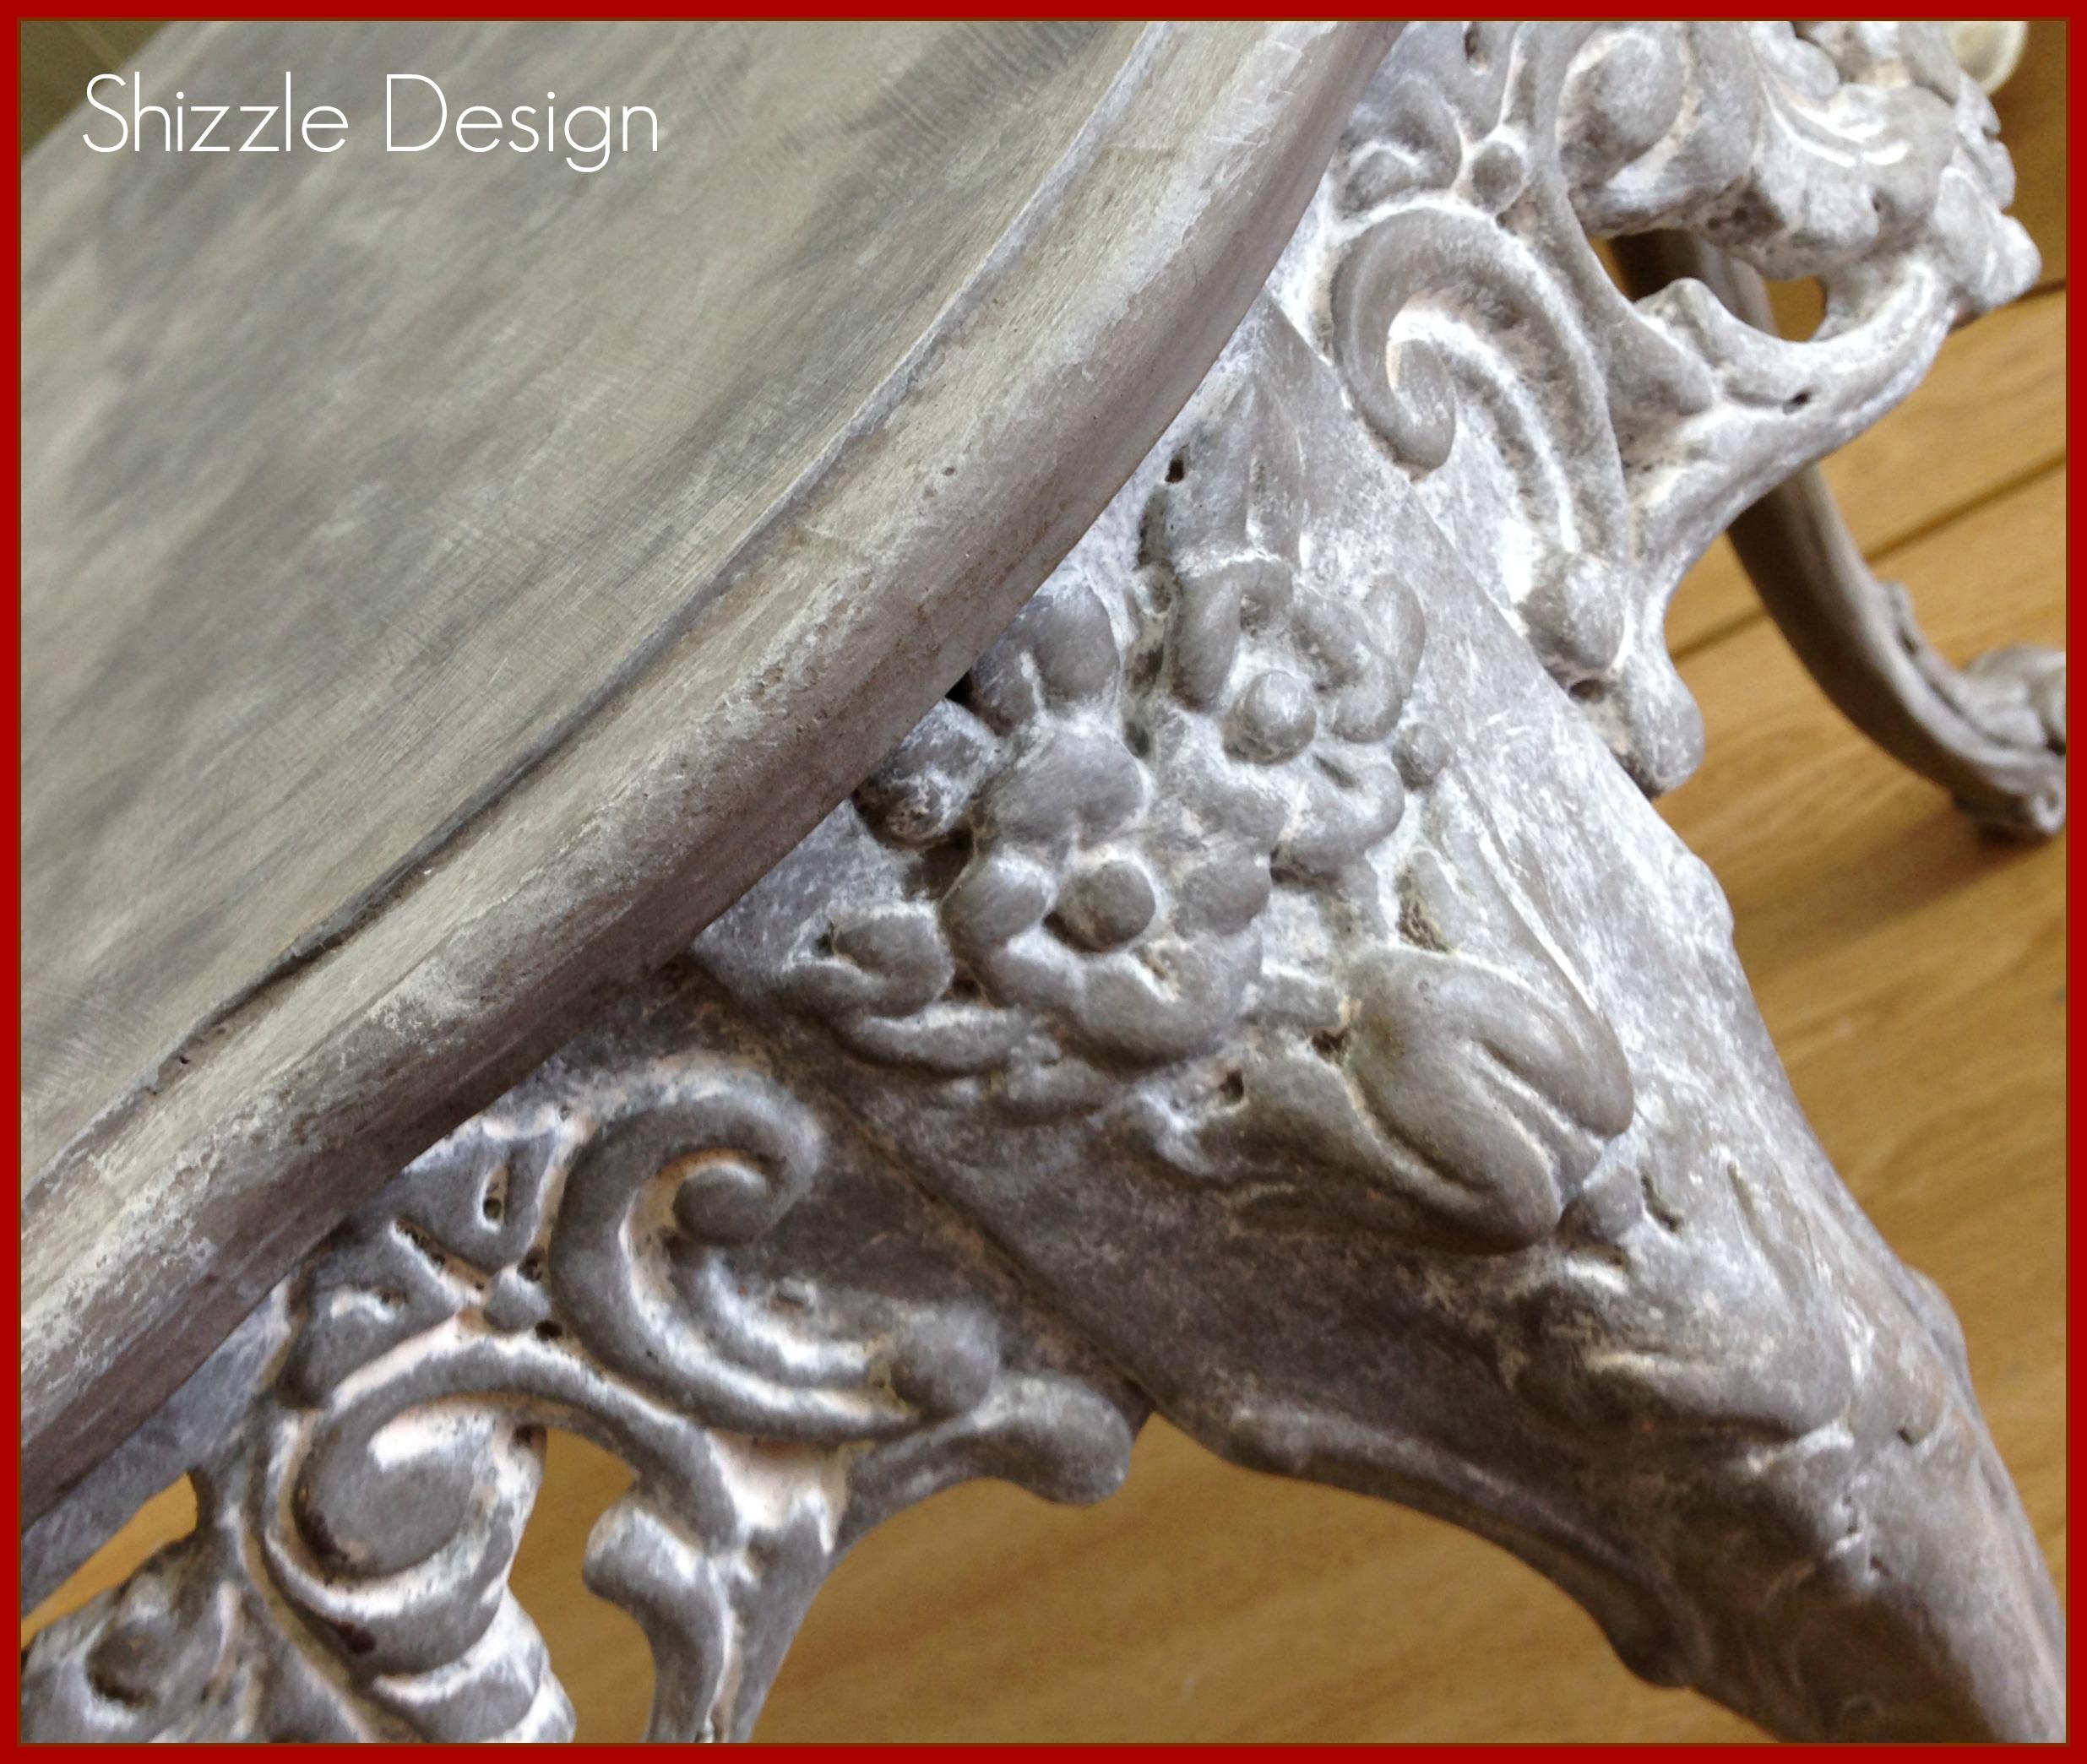 American Paint Company Shizzle Design